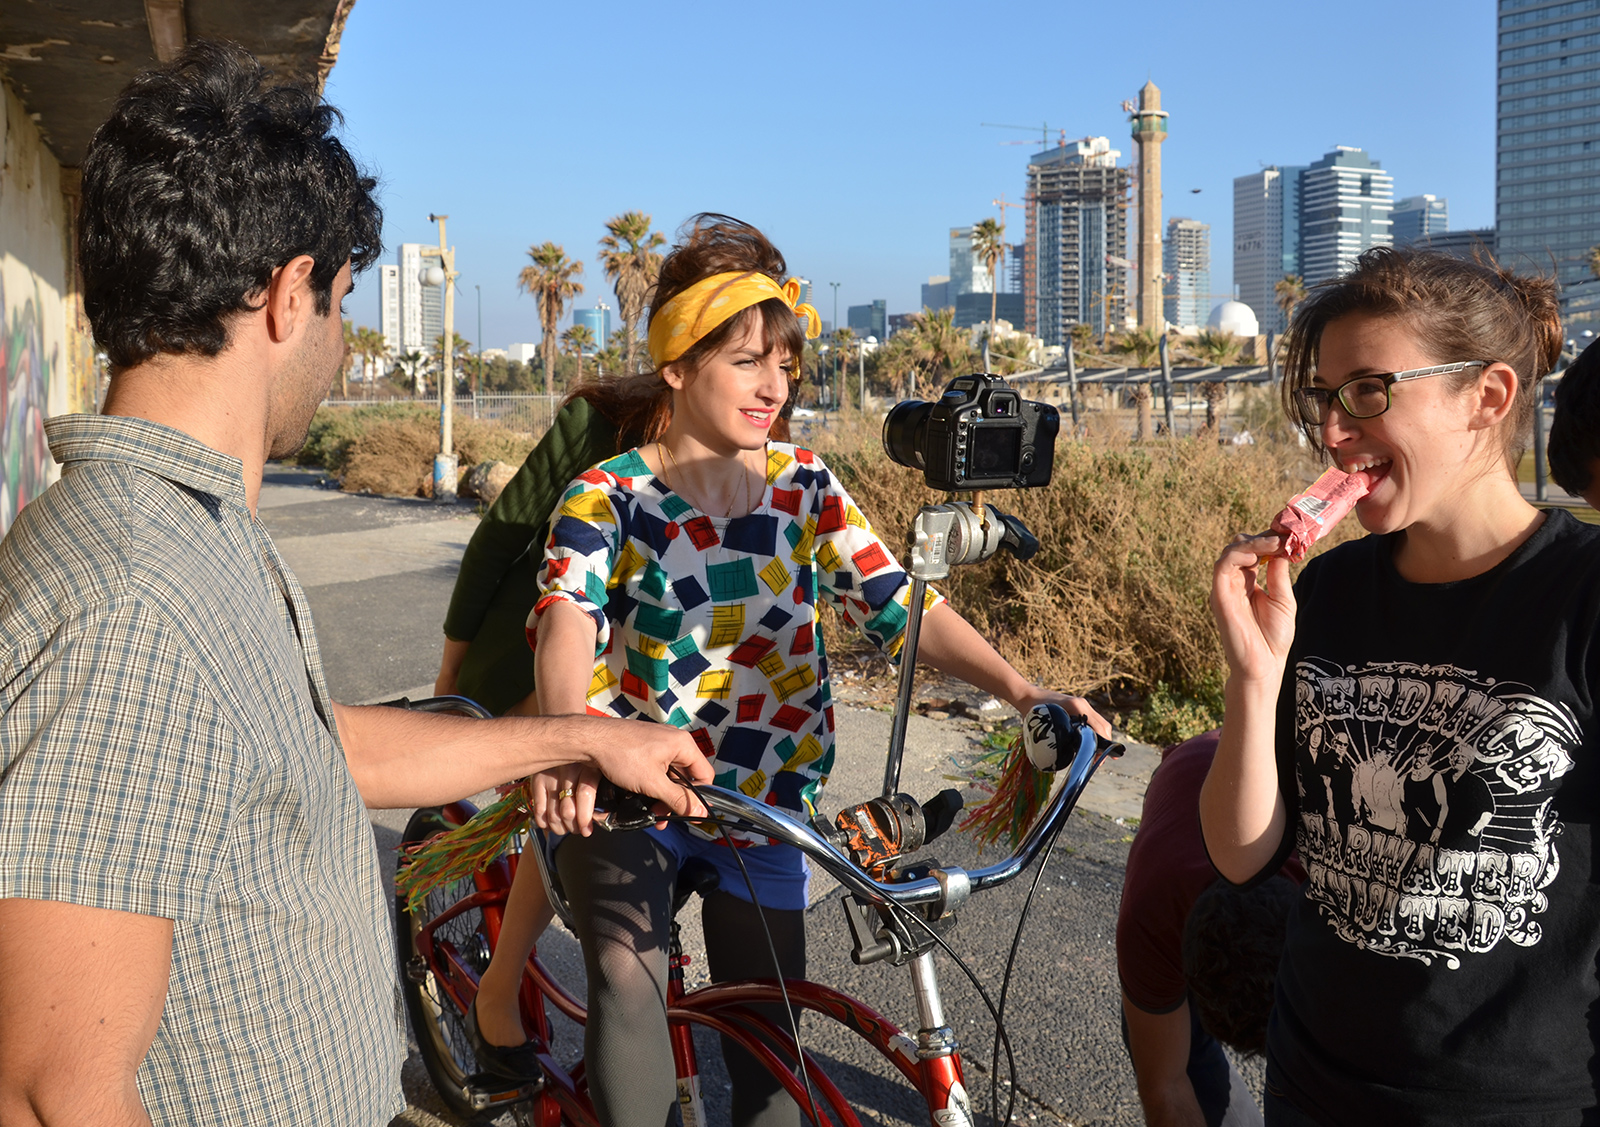 jak se natáčí reklama, Tel-Aviv, Izrael